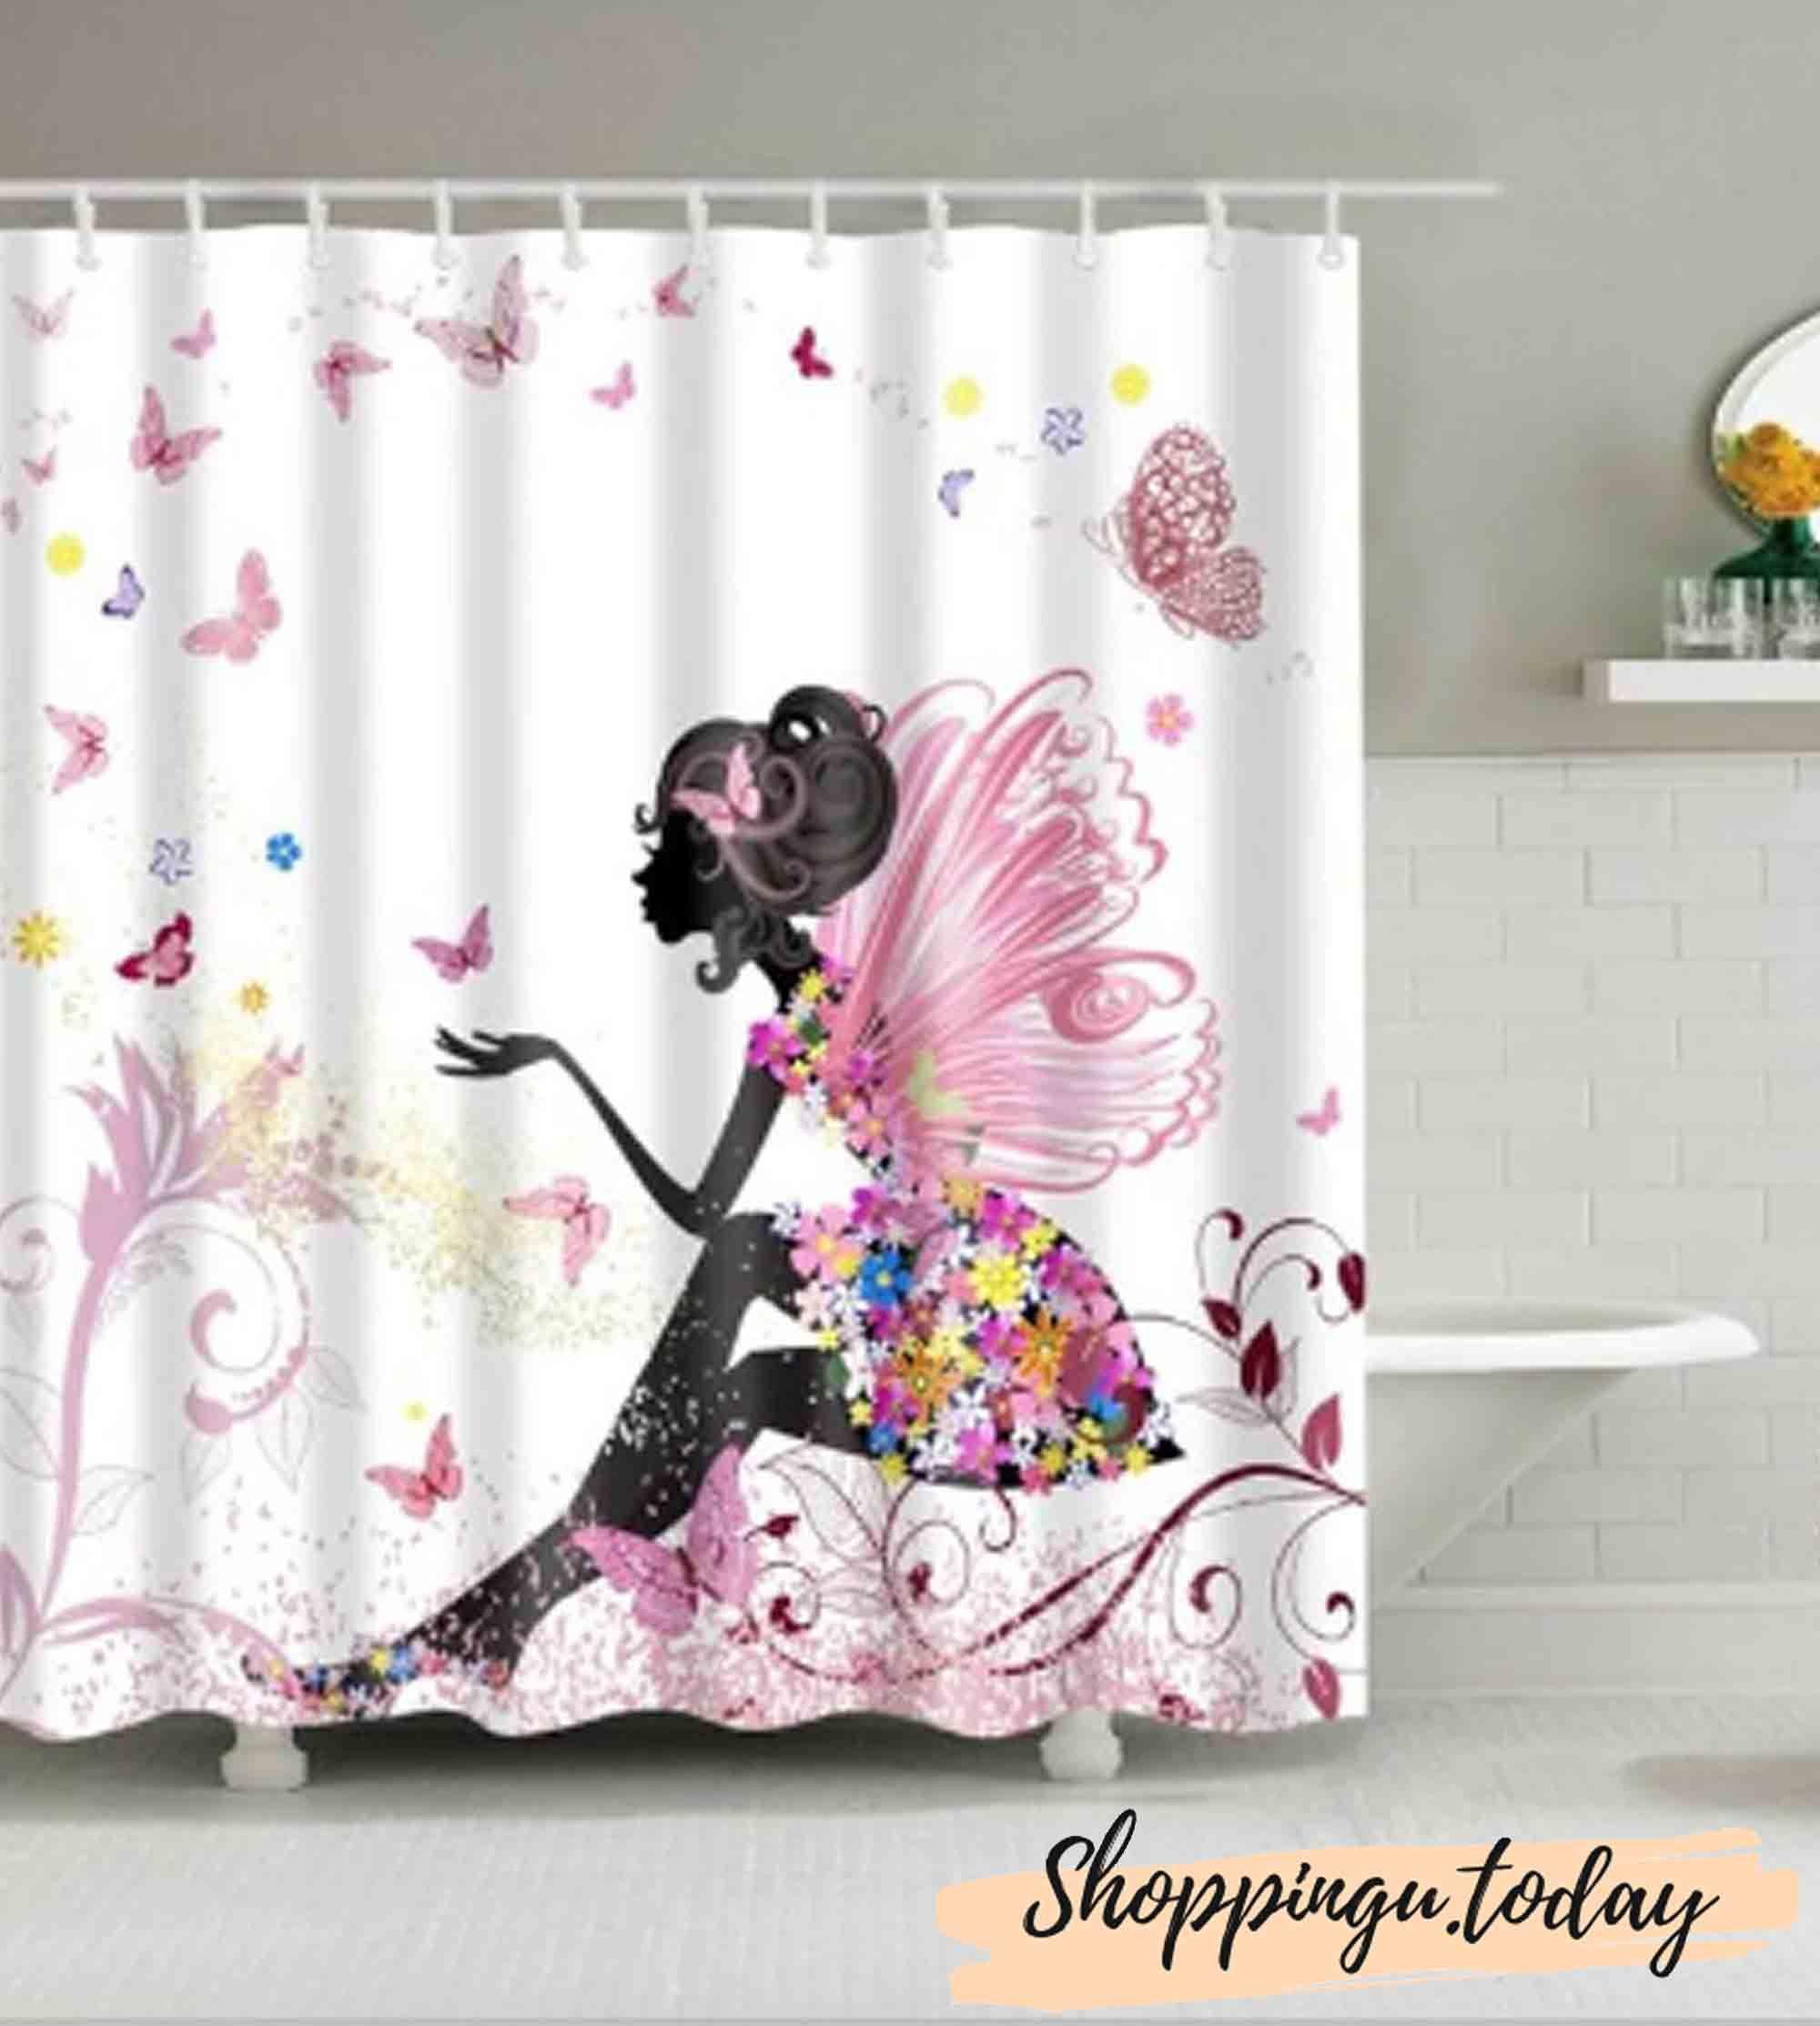 Angel Bathroom Shower Curtain Bs0120 In 2020 Girly Shower